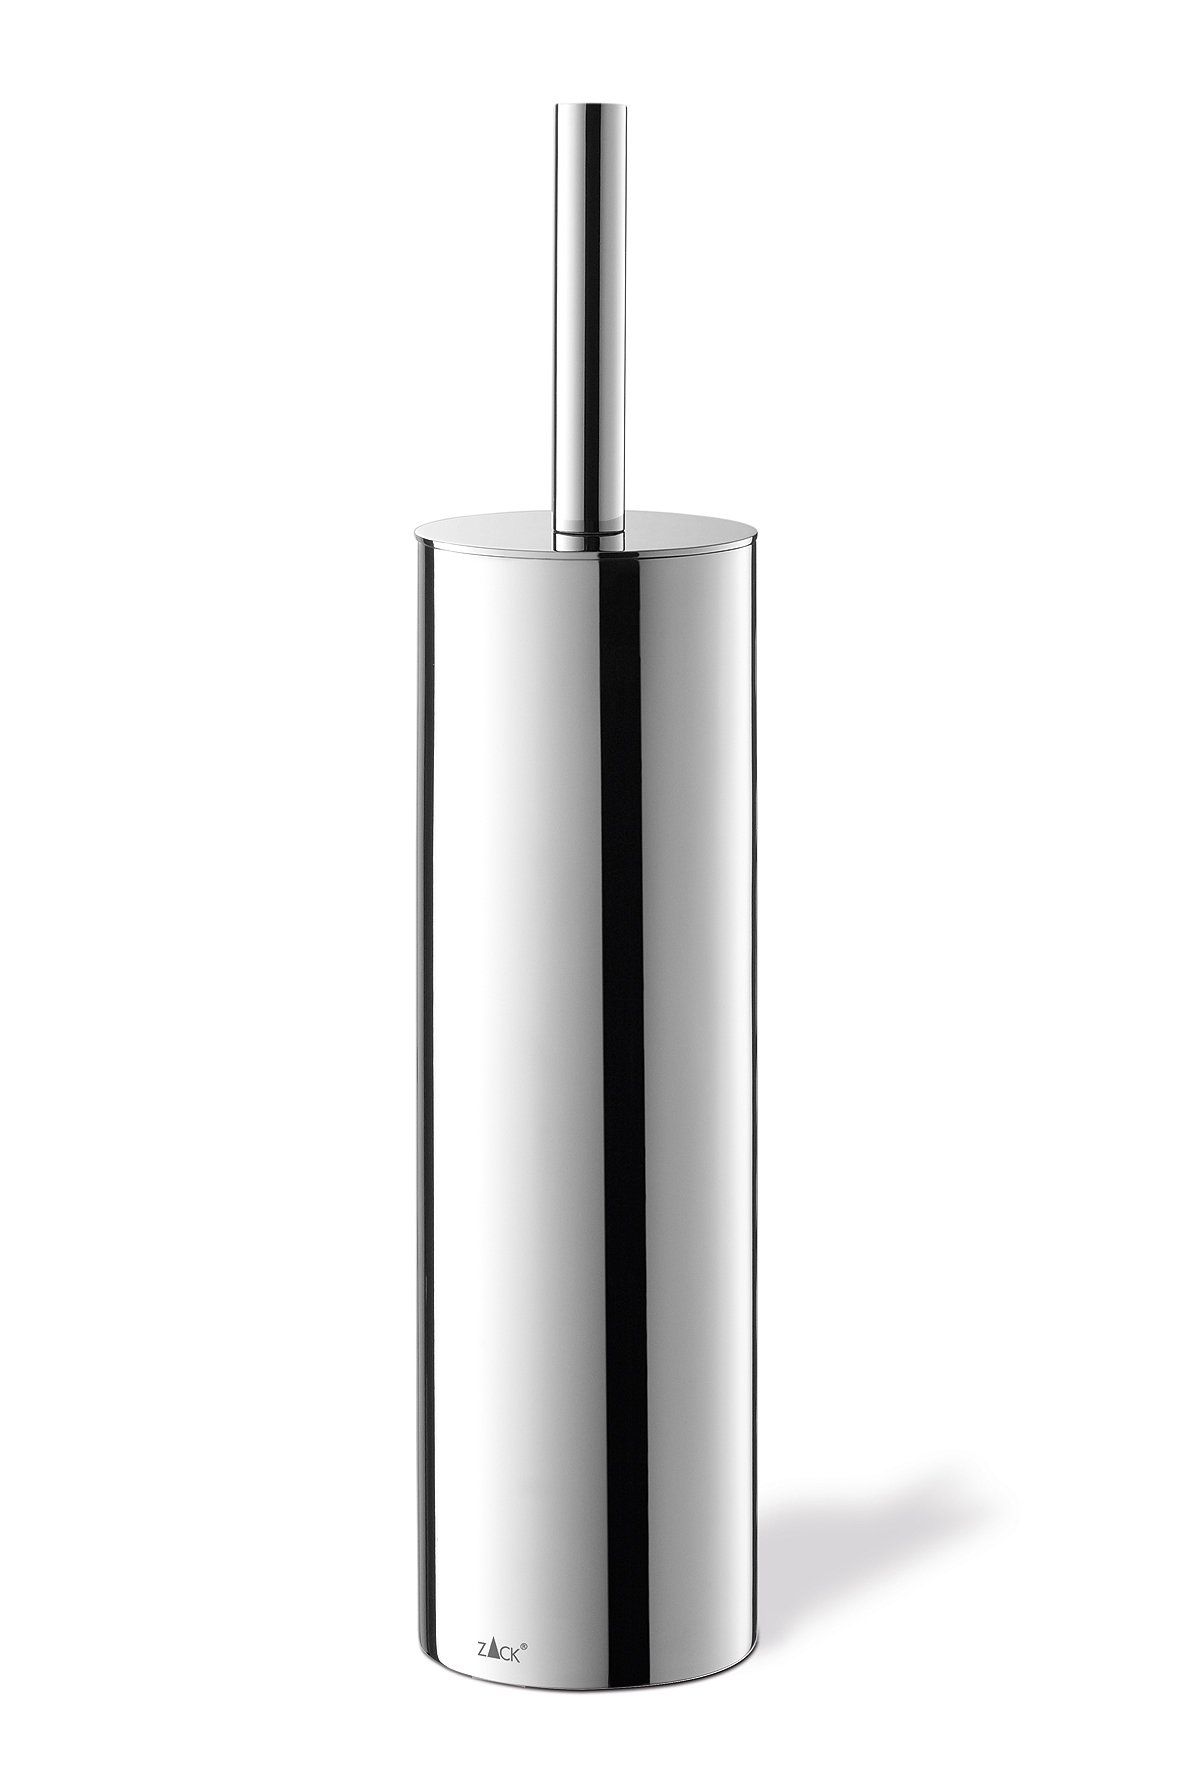 Zack 40069 Tubo Toilet Brush Set, Mirror Polished Finish, 15.94 by 3.54-Inch by Zack